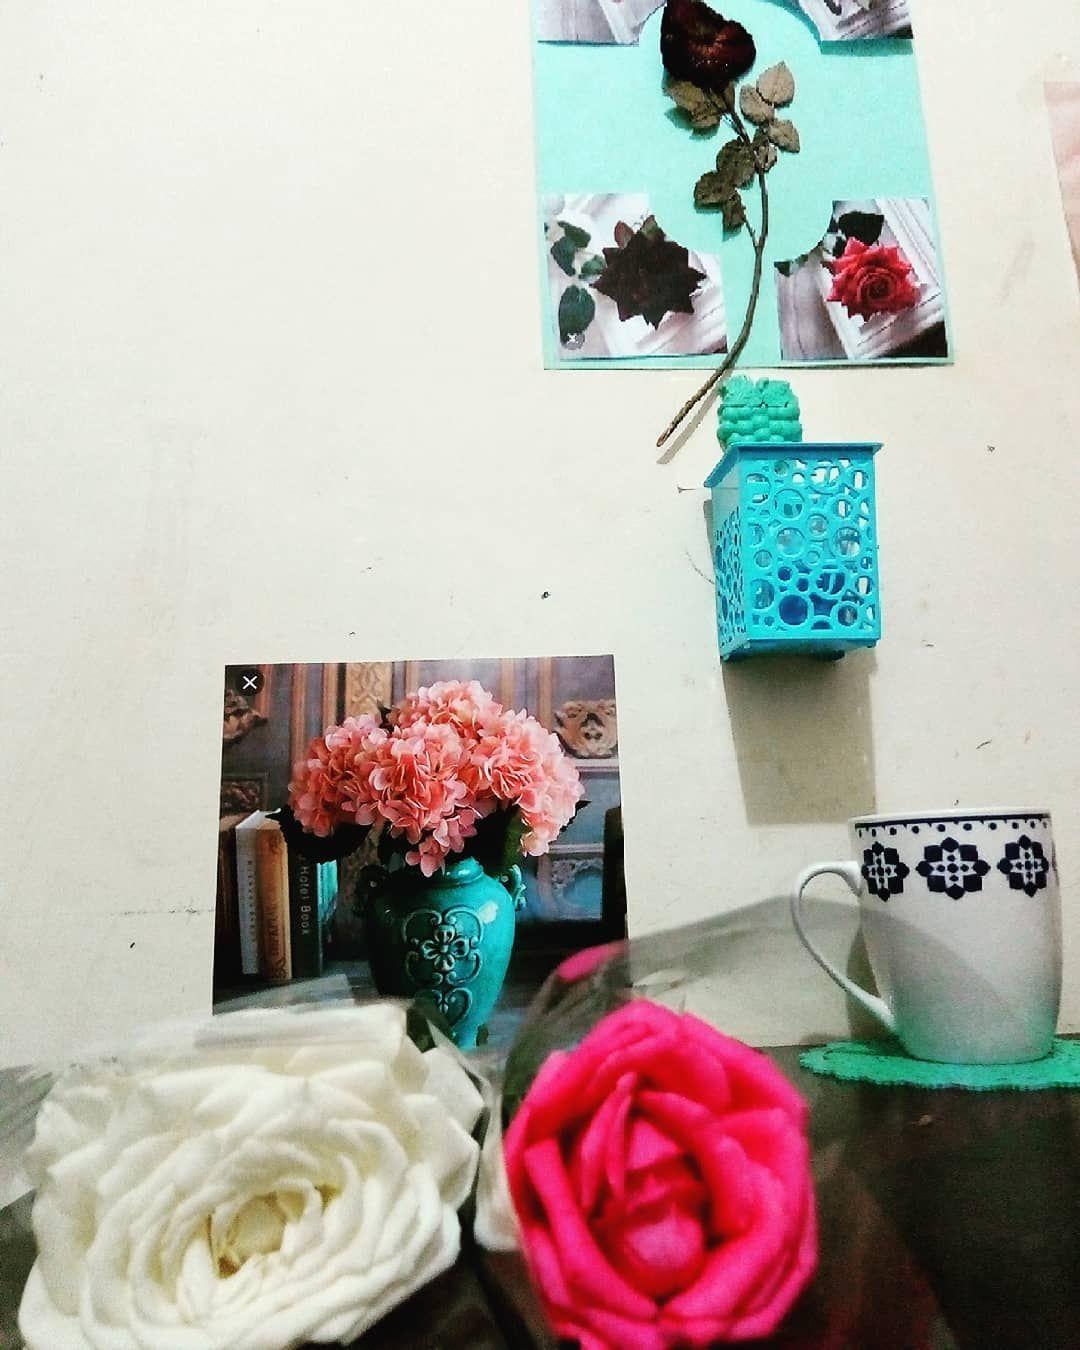 :) #H #تصويري  #flawers  #nature #naturephotography #naturelovers #natgeo #nails #nature_perfection #naturelovers #naturalhair #fleuriste #flower_shotz #flower_n_co #flamengo #flawers #fleur #